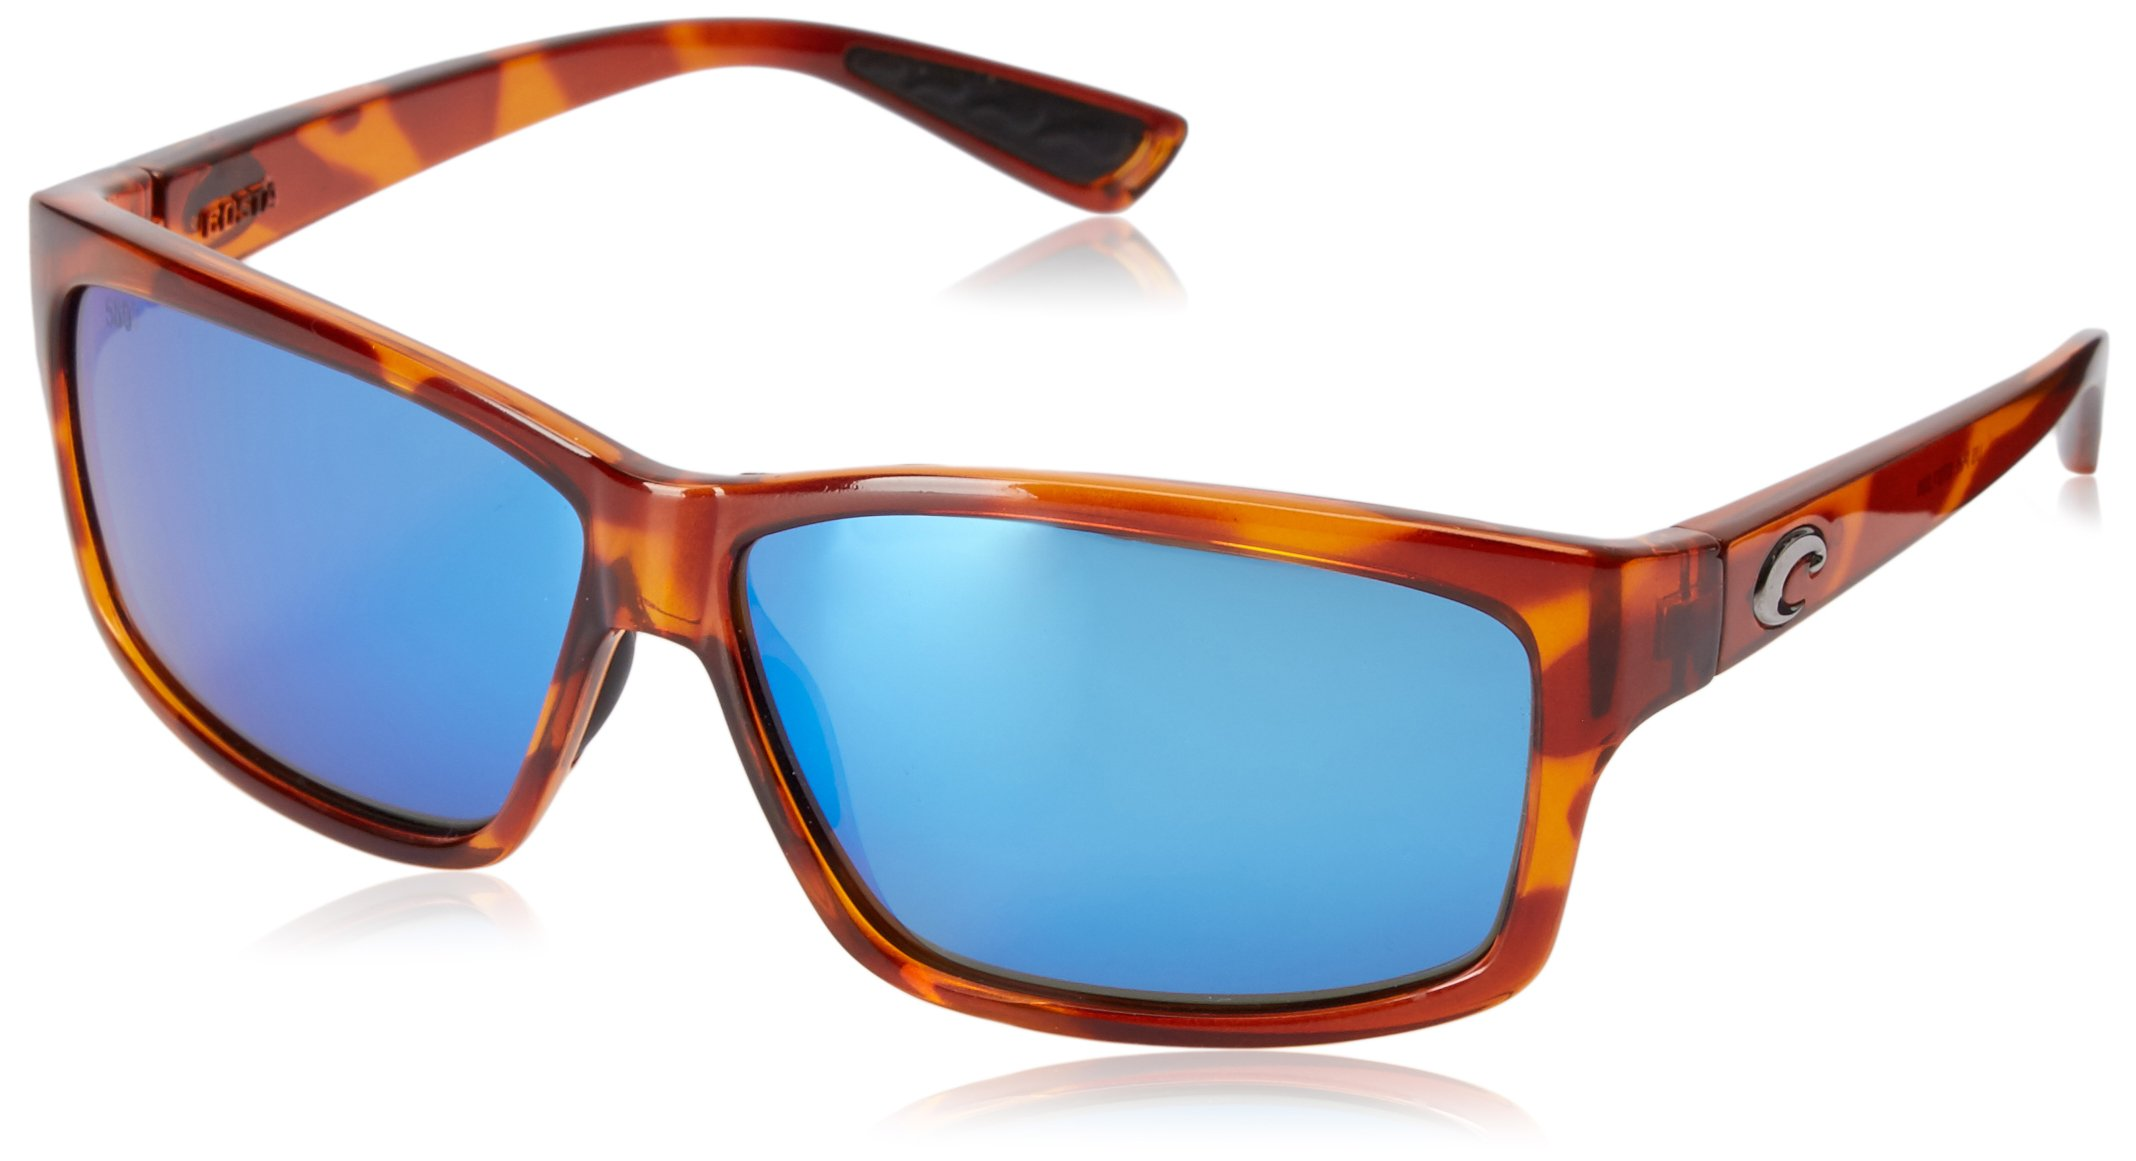 Costa del Mar Cut Polarized Rectangular Sunglasses, Honey Tortoise/Blue Mirror 580 Glass